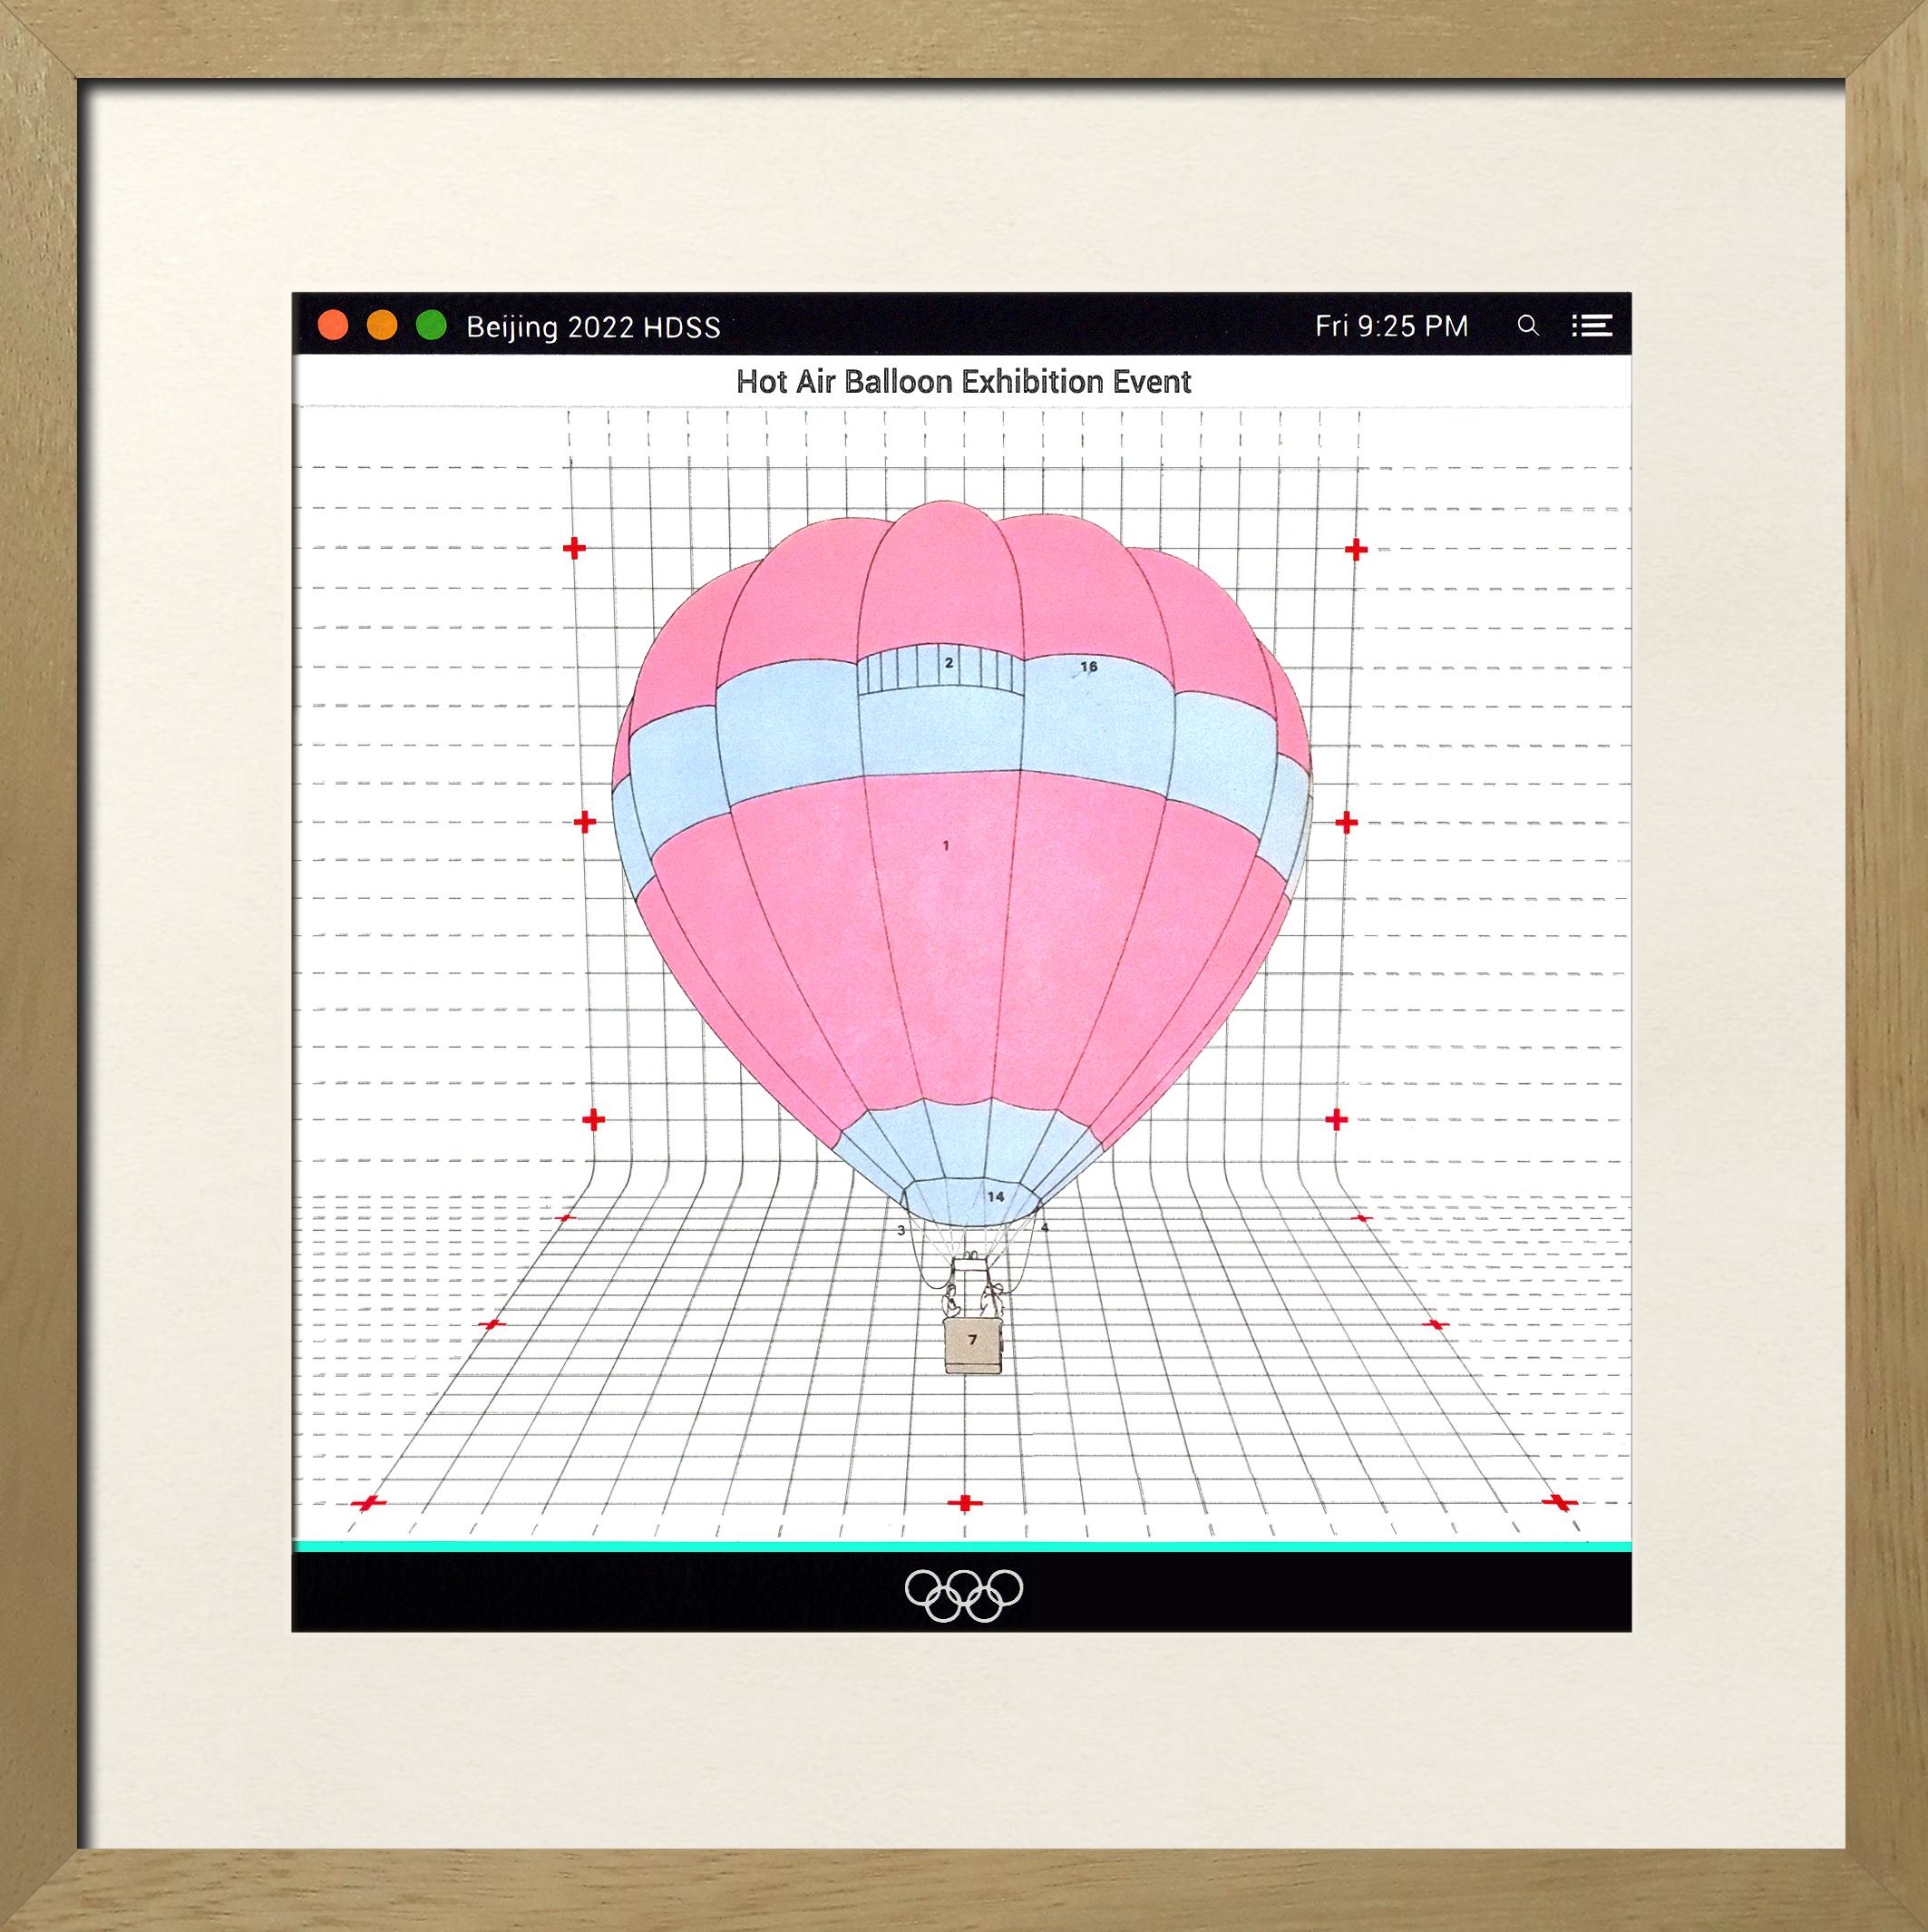 Hot Air Balloon Exhibition Event